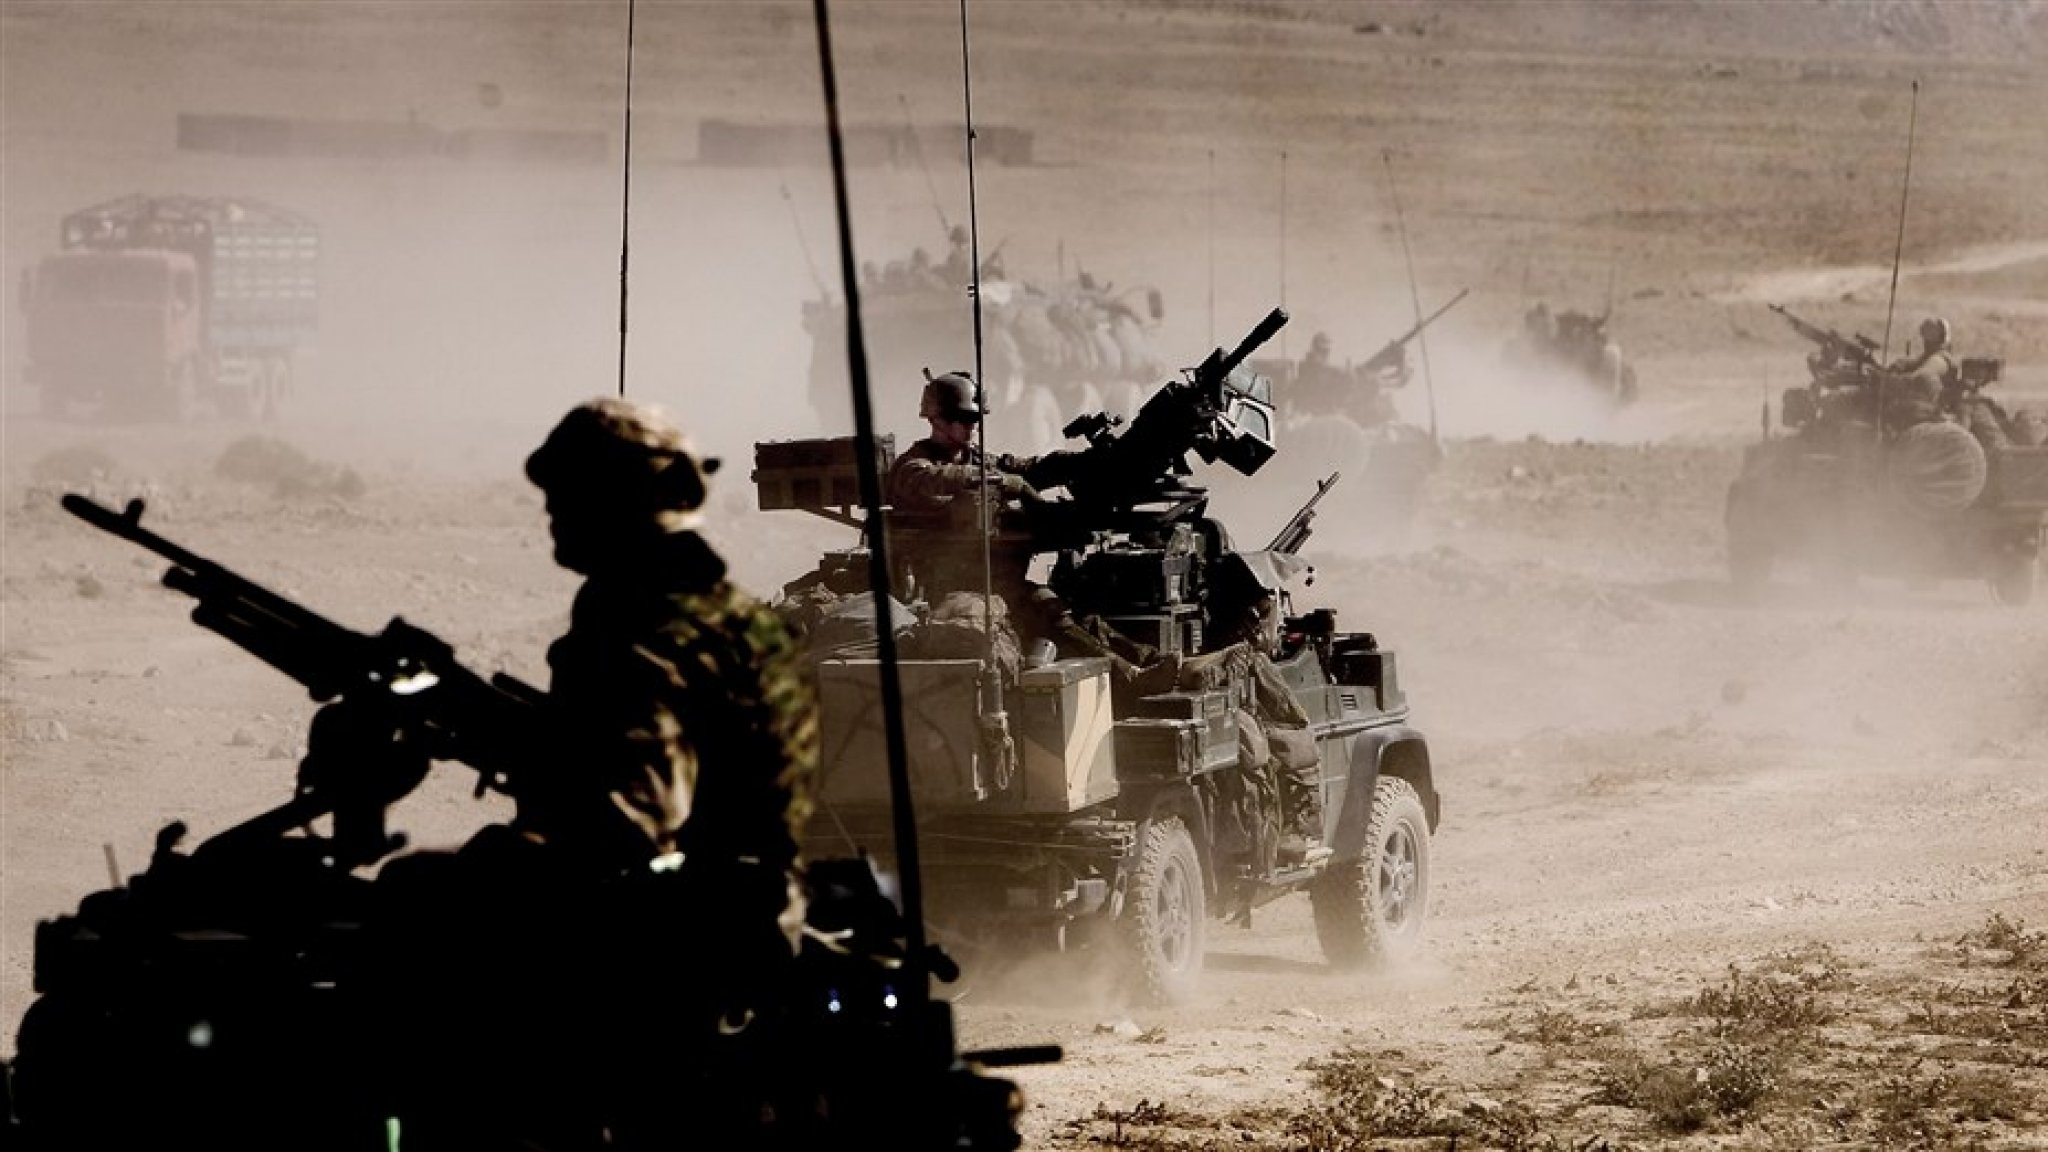 Dutch soldiers leave Afghanistan